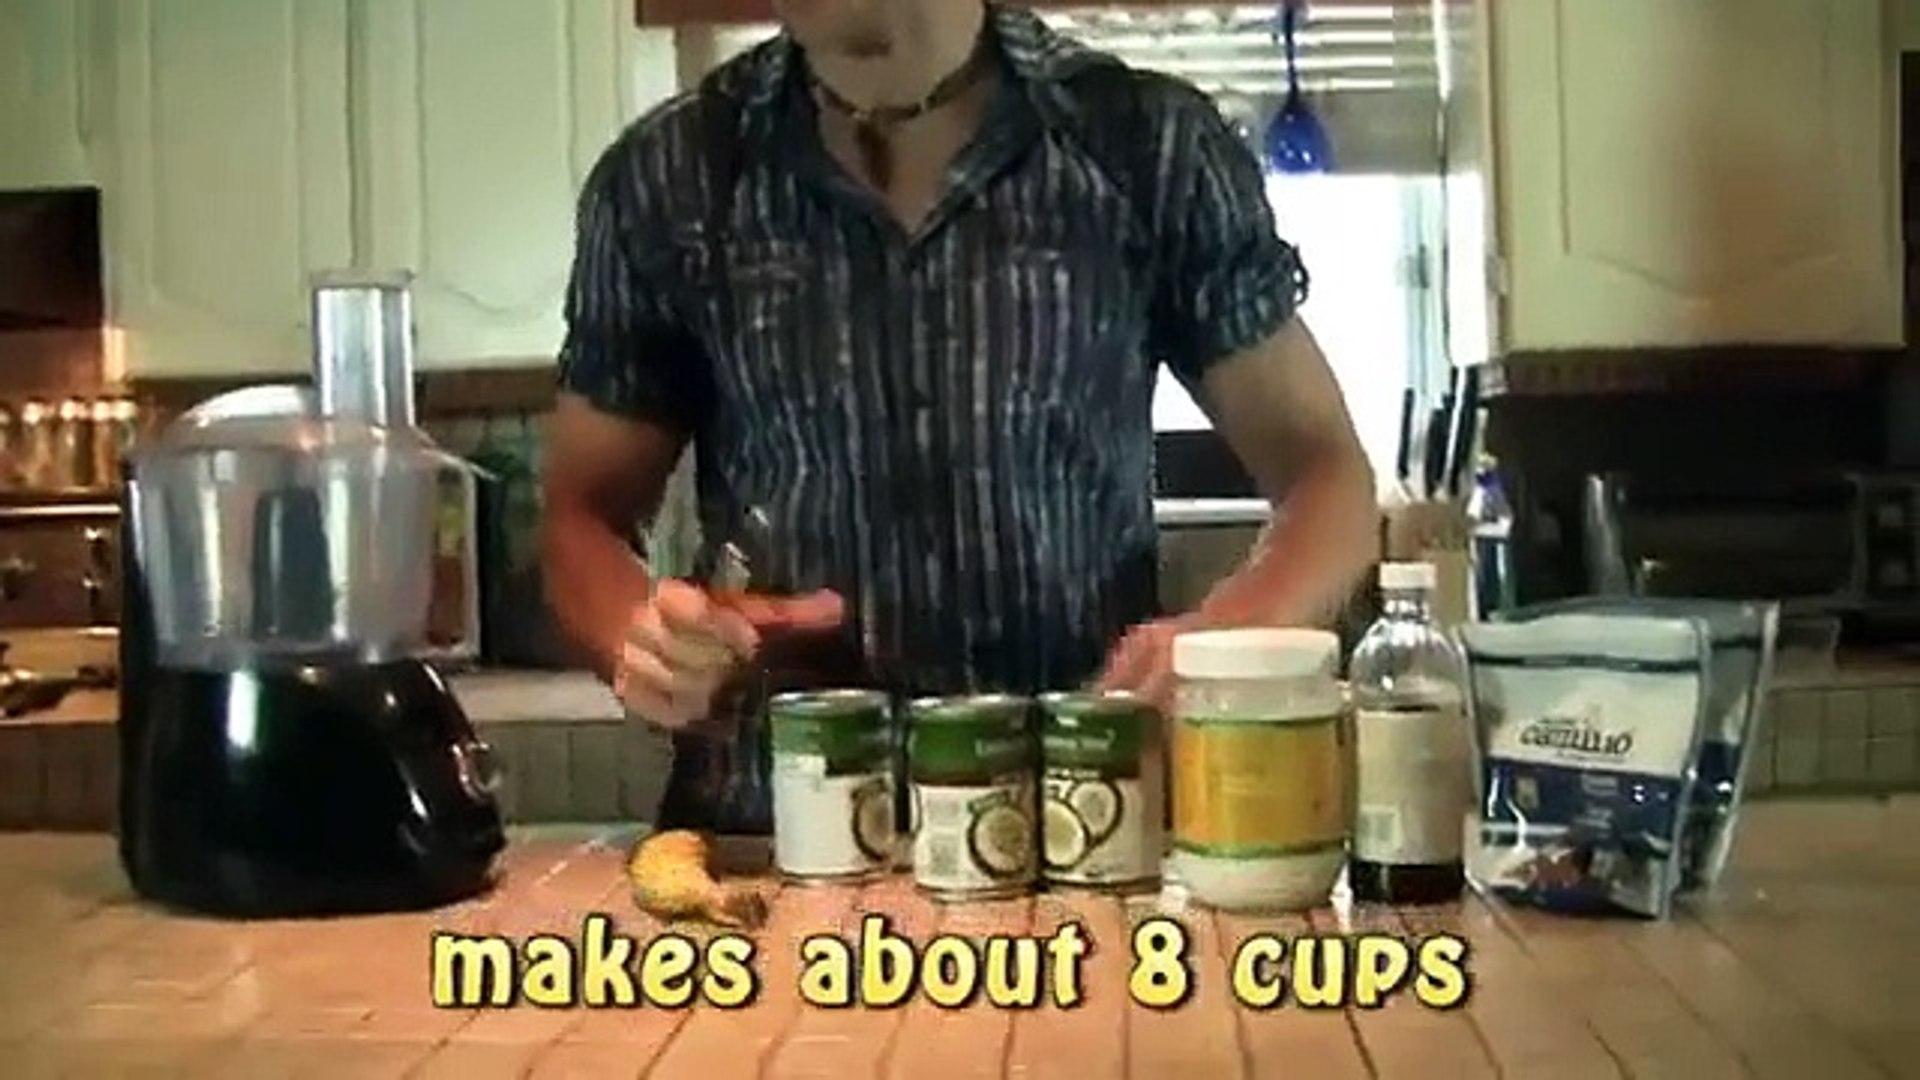 paleo recipes crossfit - Paleo Recipe Book